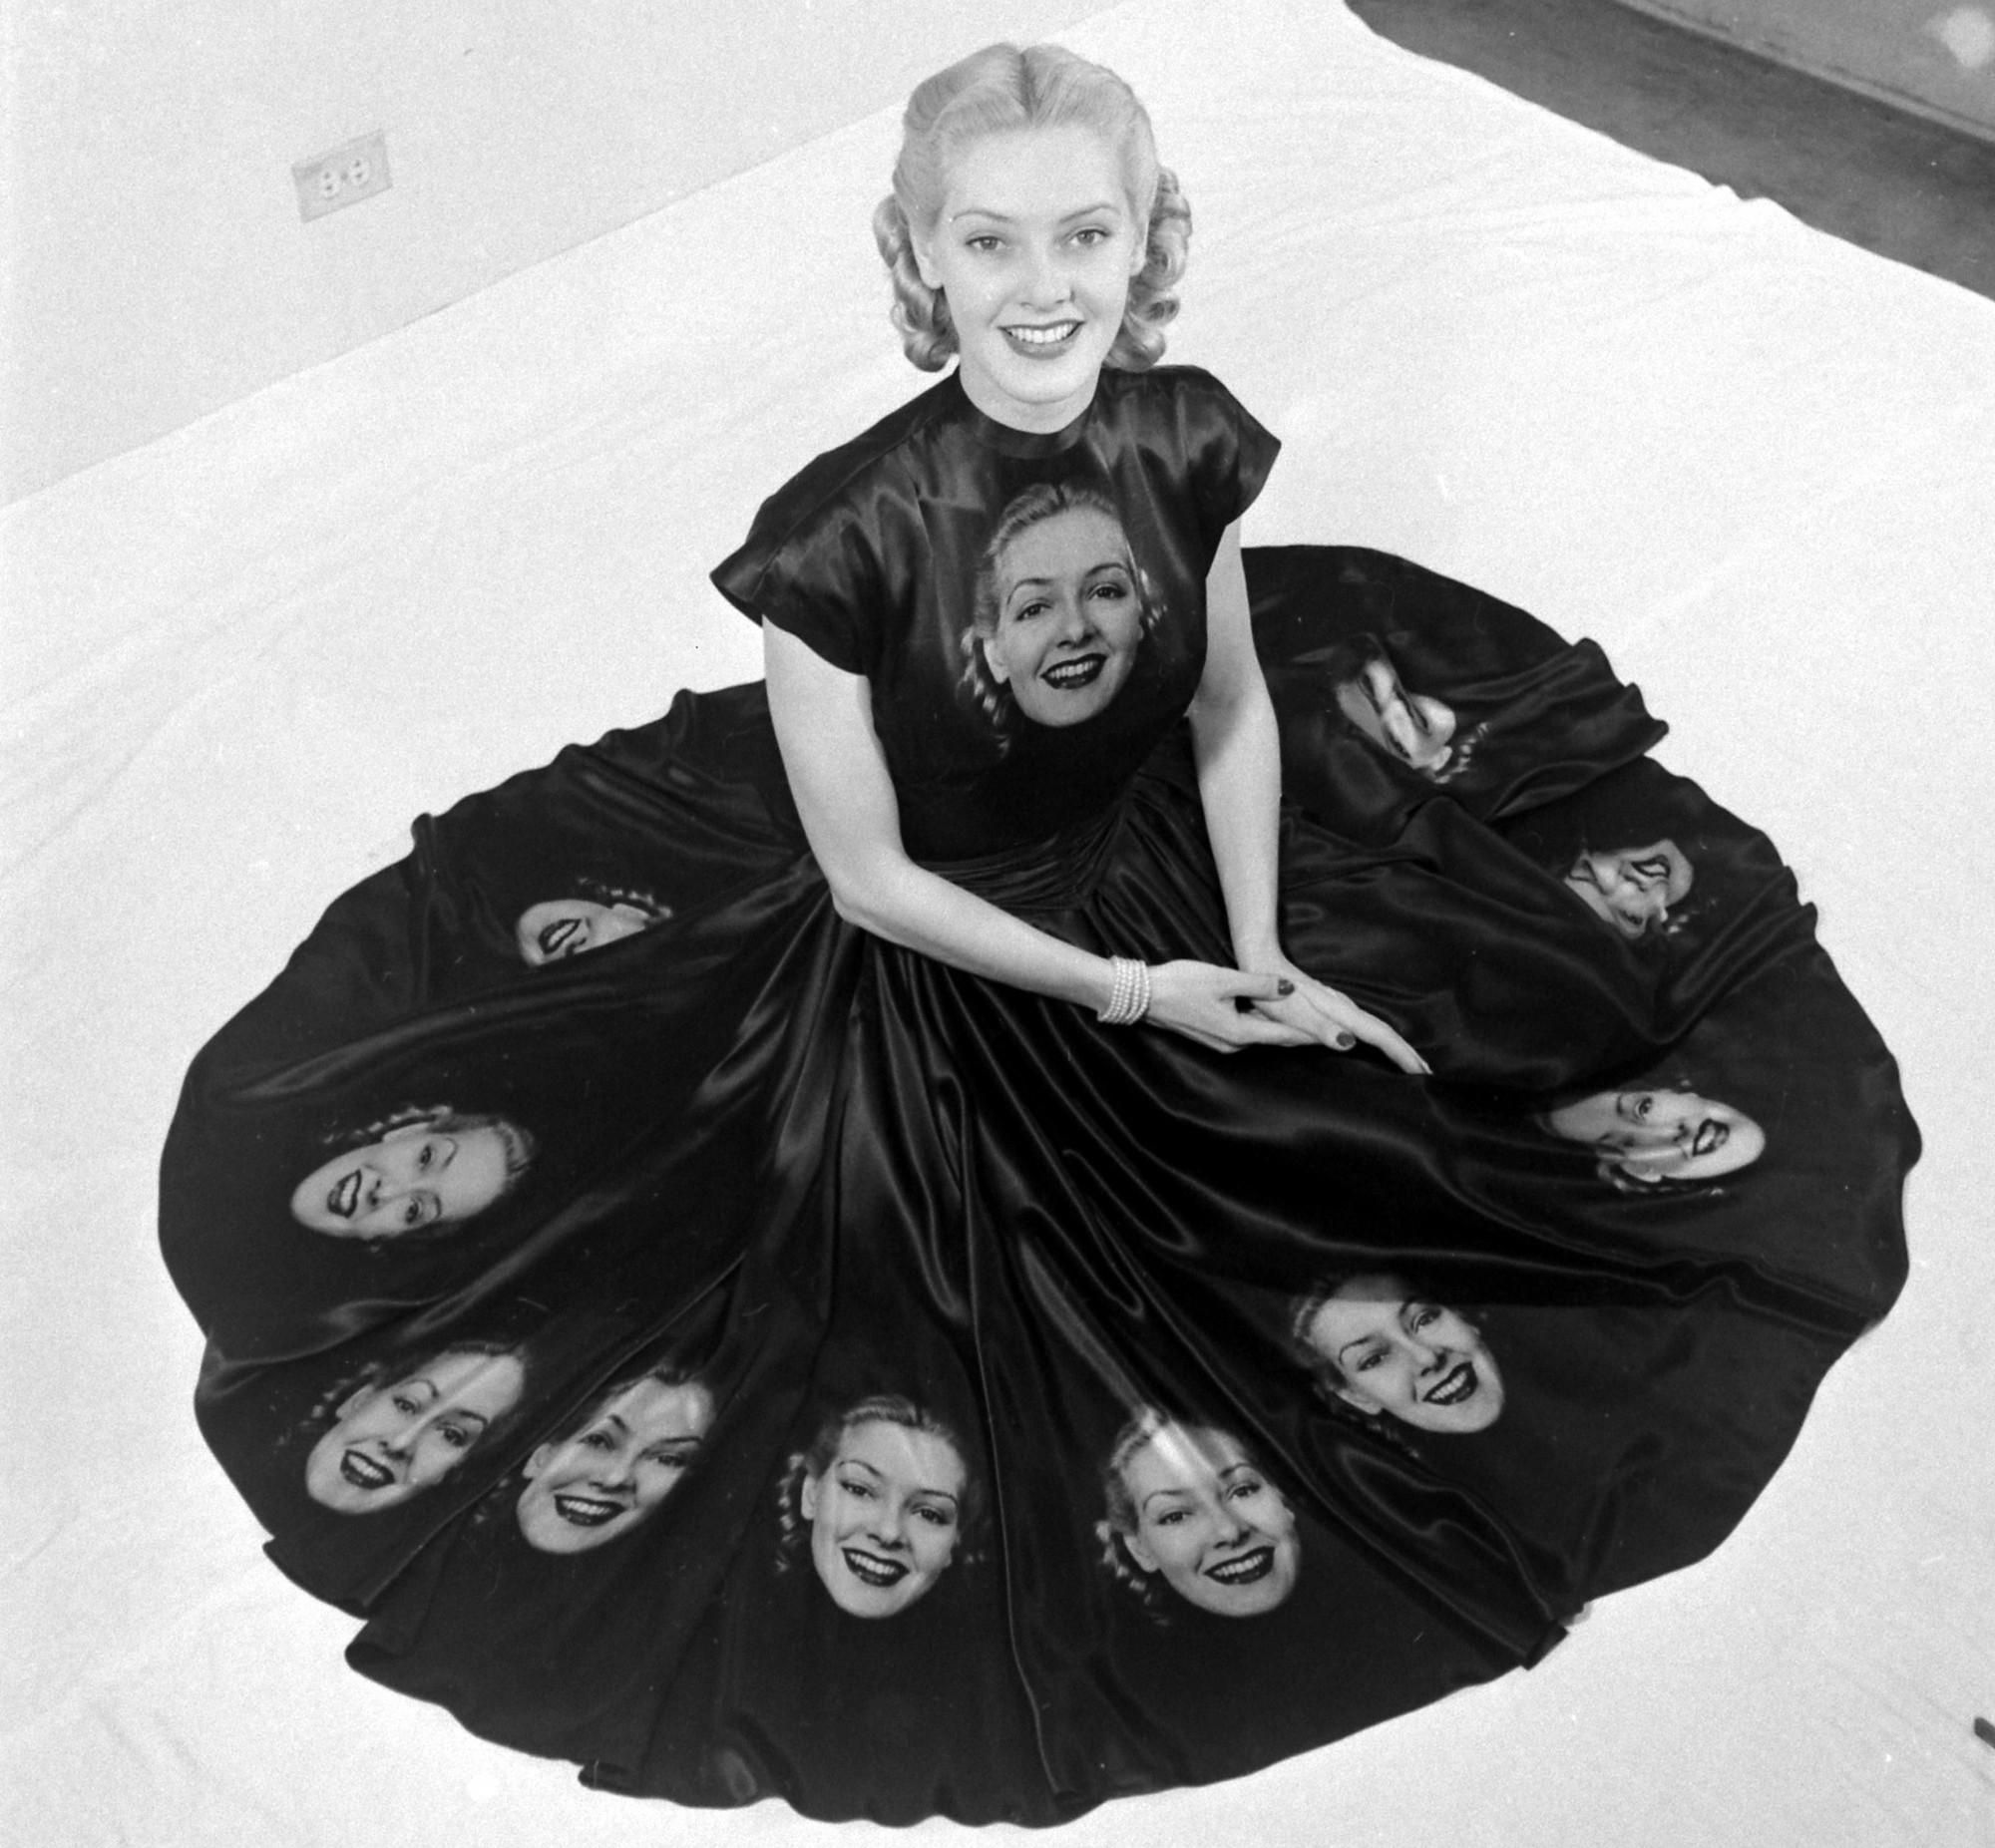 Model Norma Richter